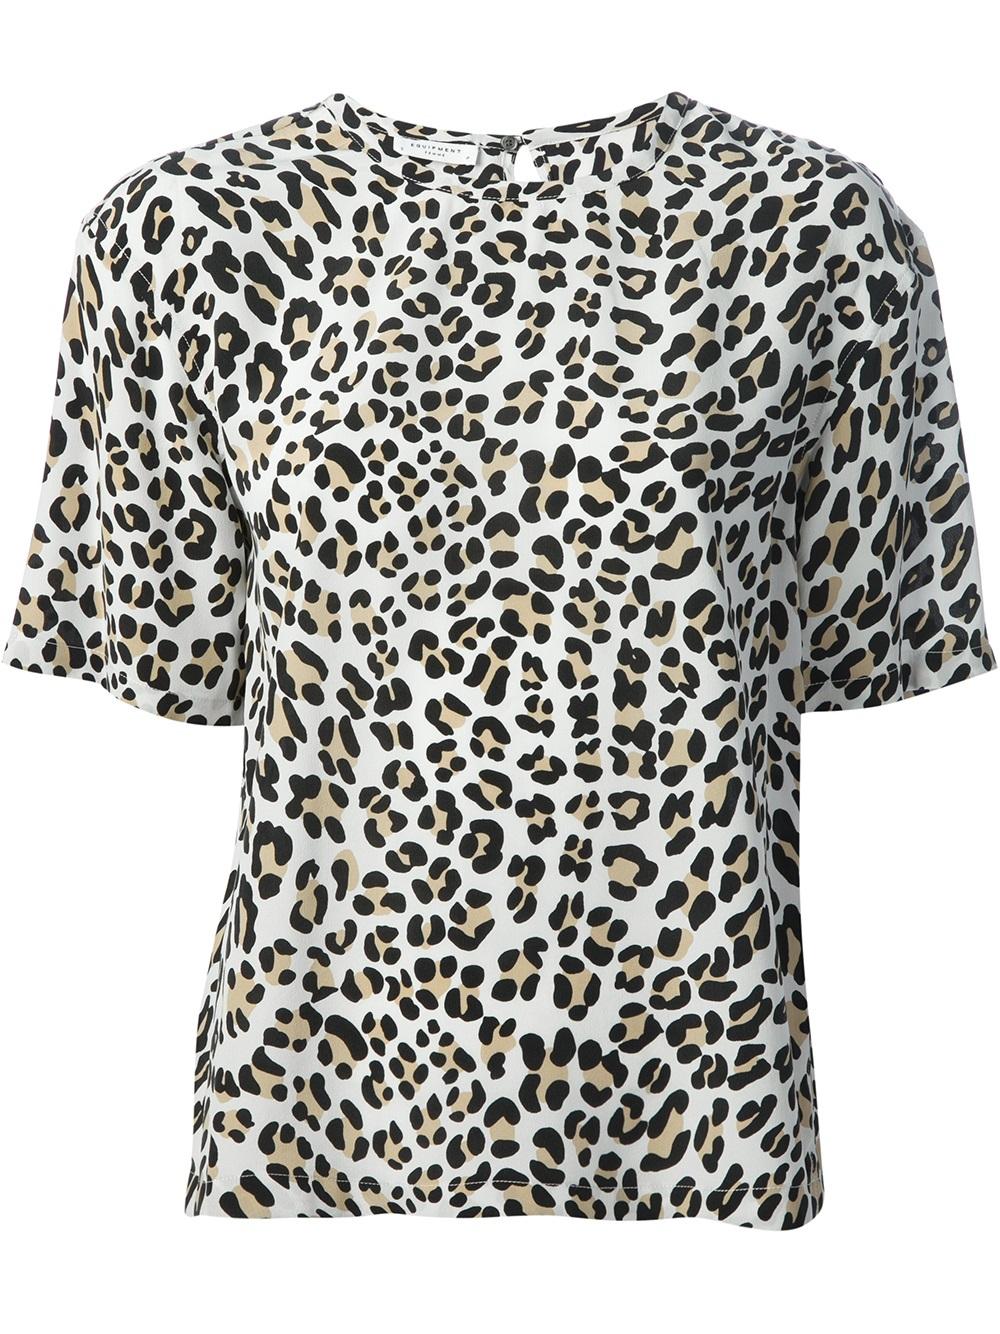 Equipment Logan Leopard Print Tshirt in Black